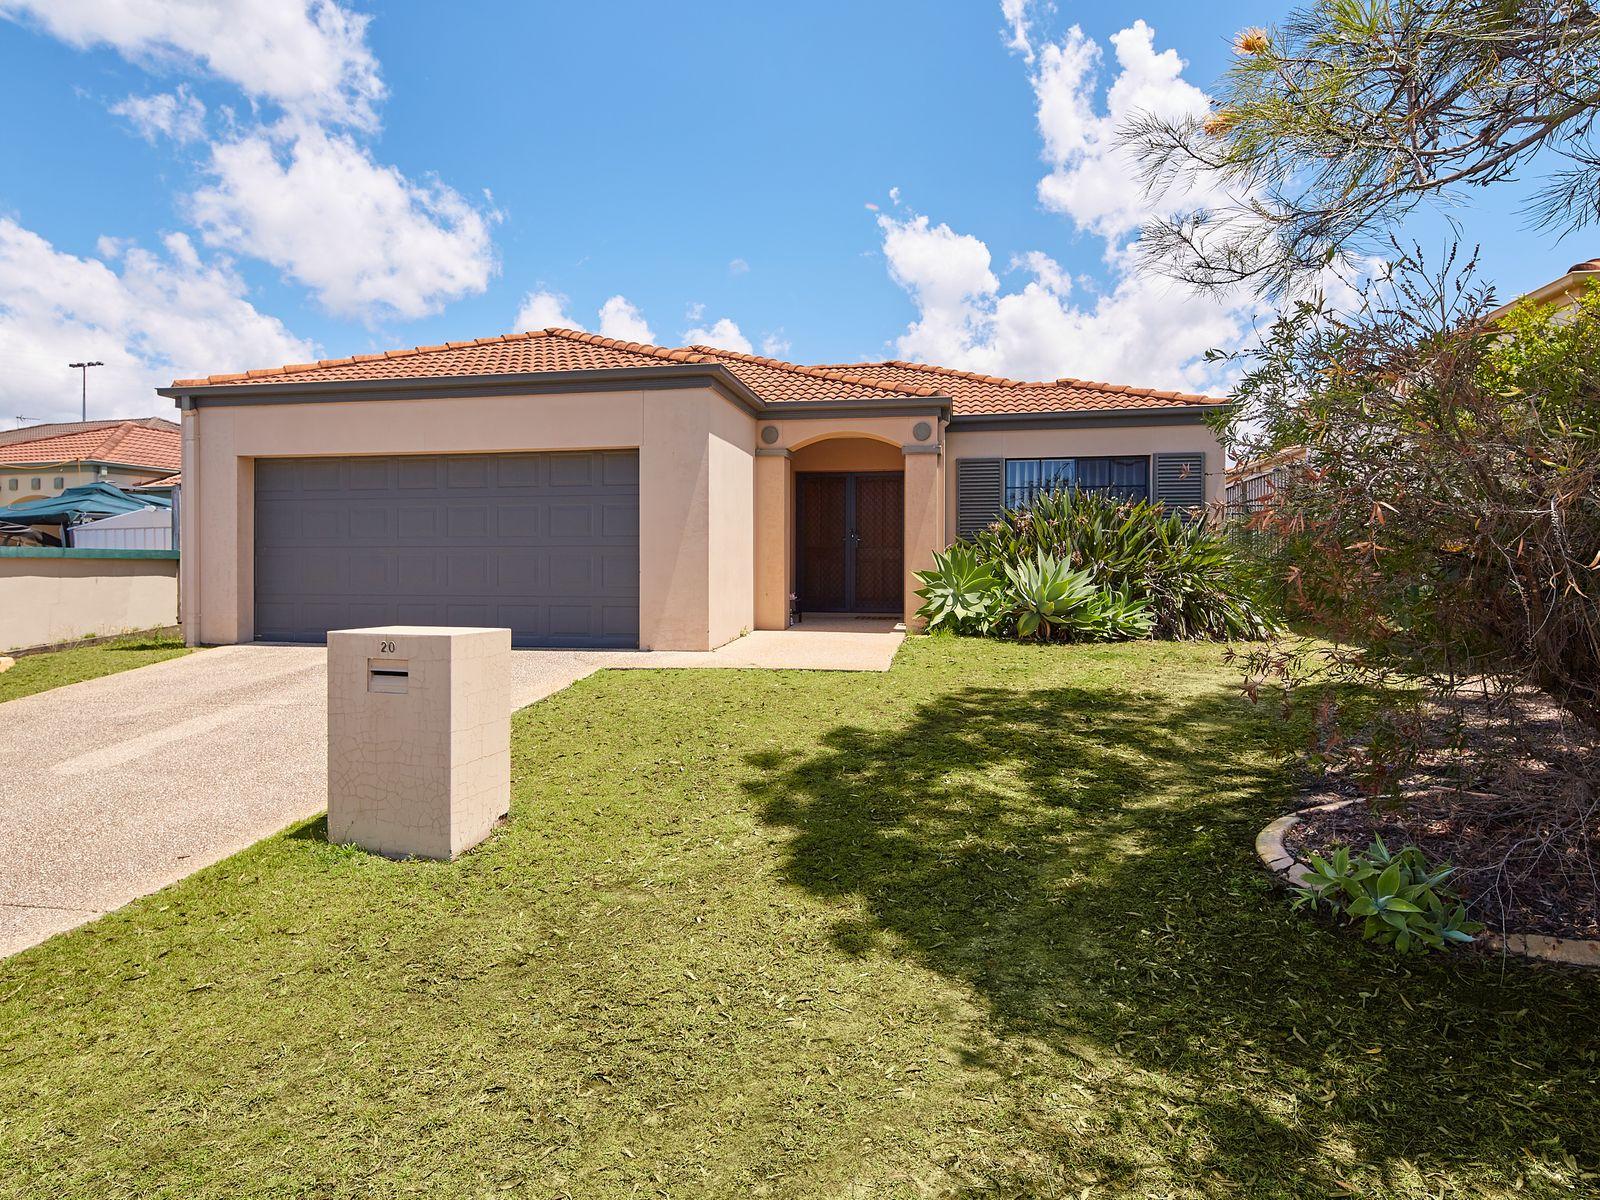 20 Prospect Court, Robina, QLD 4226